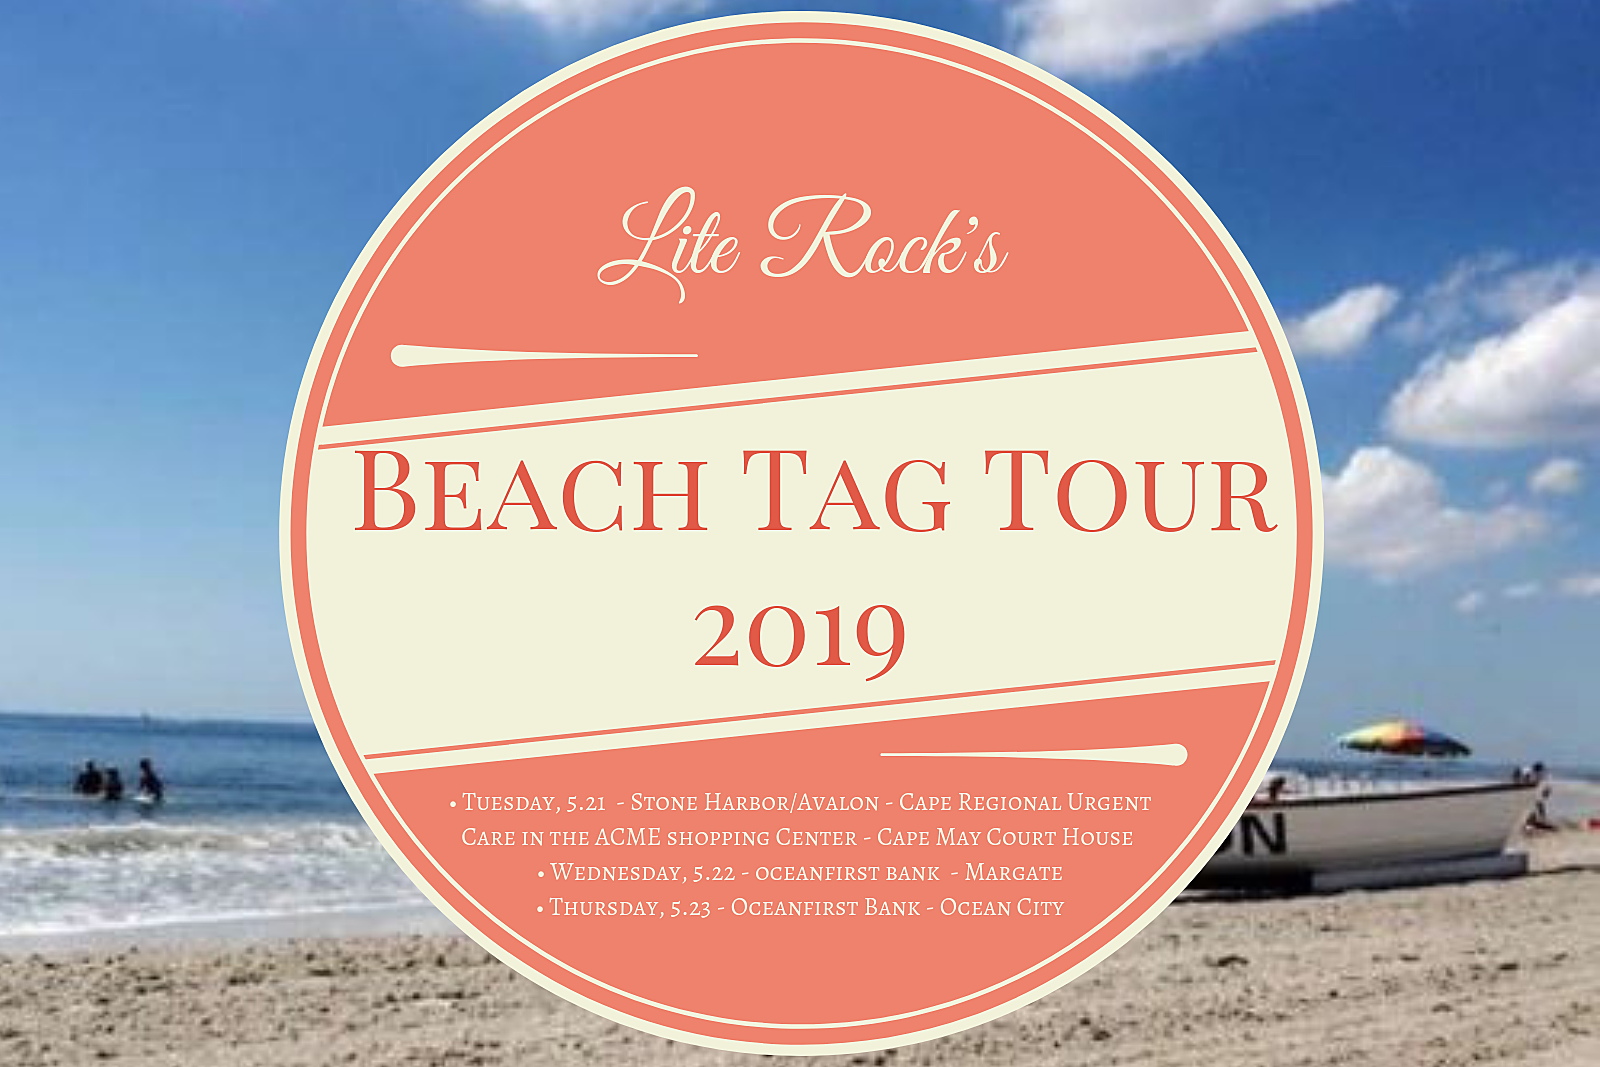 Lite Rock S Free Beach Tag Tour 2019